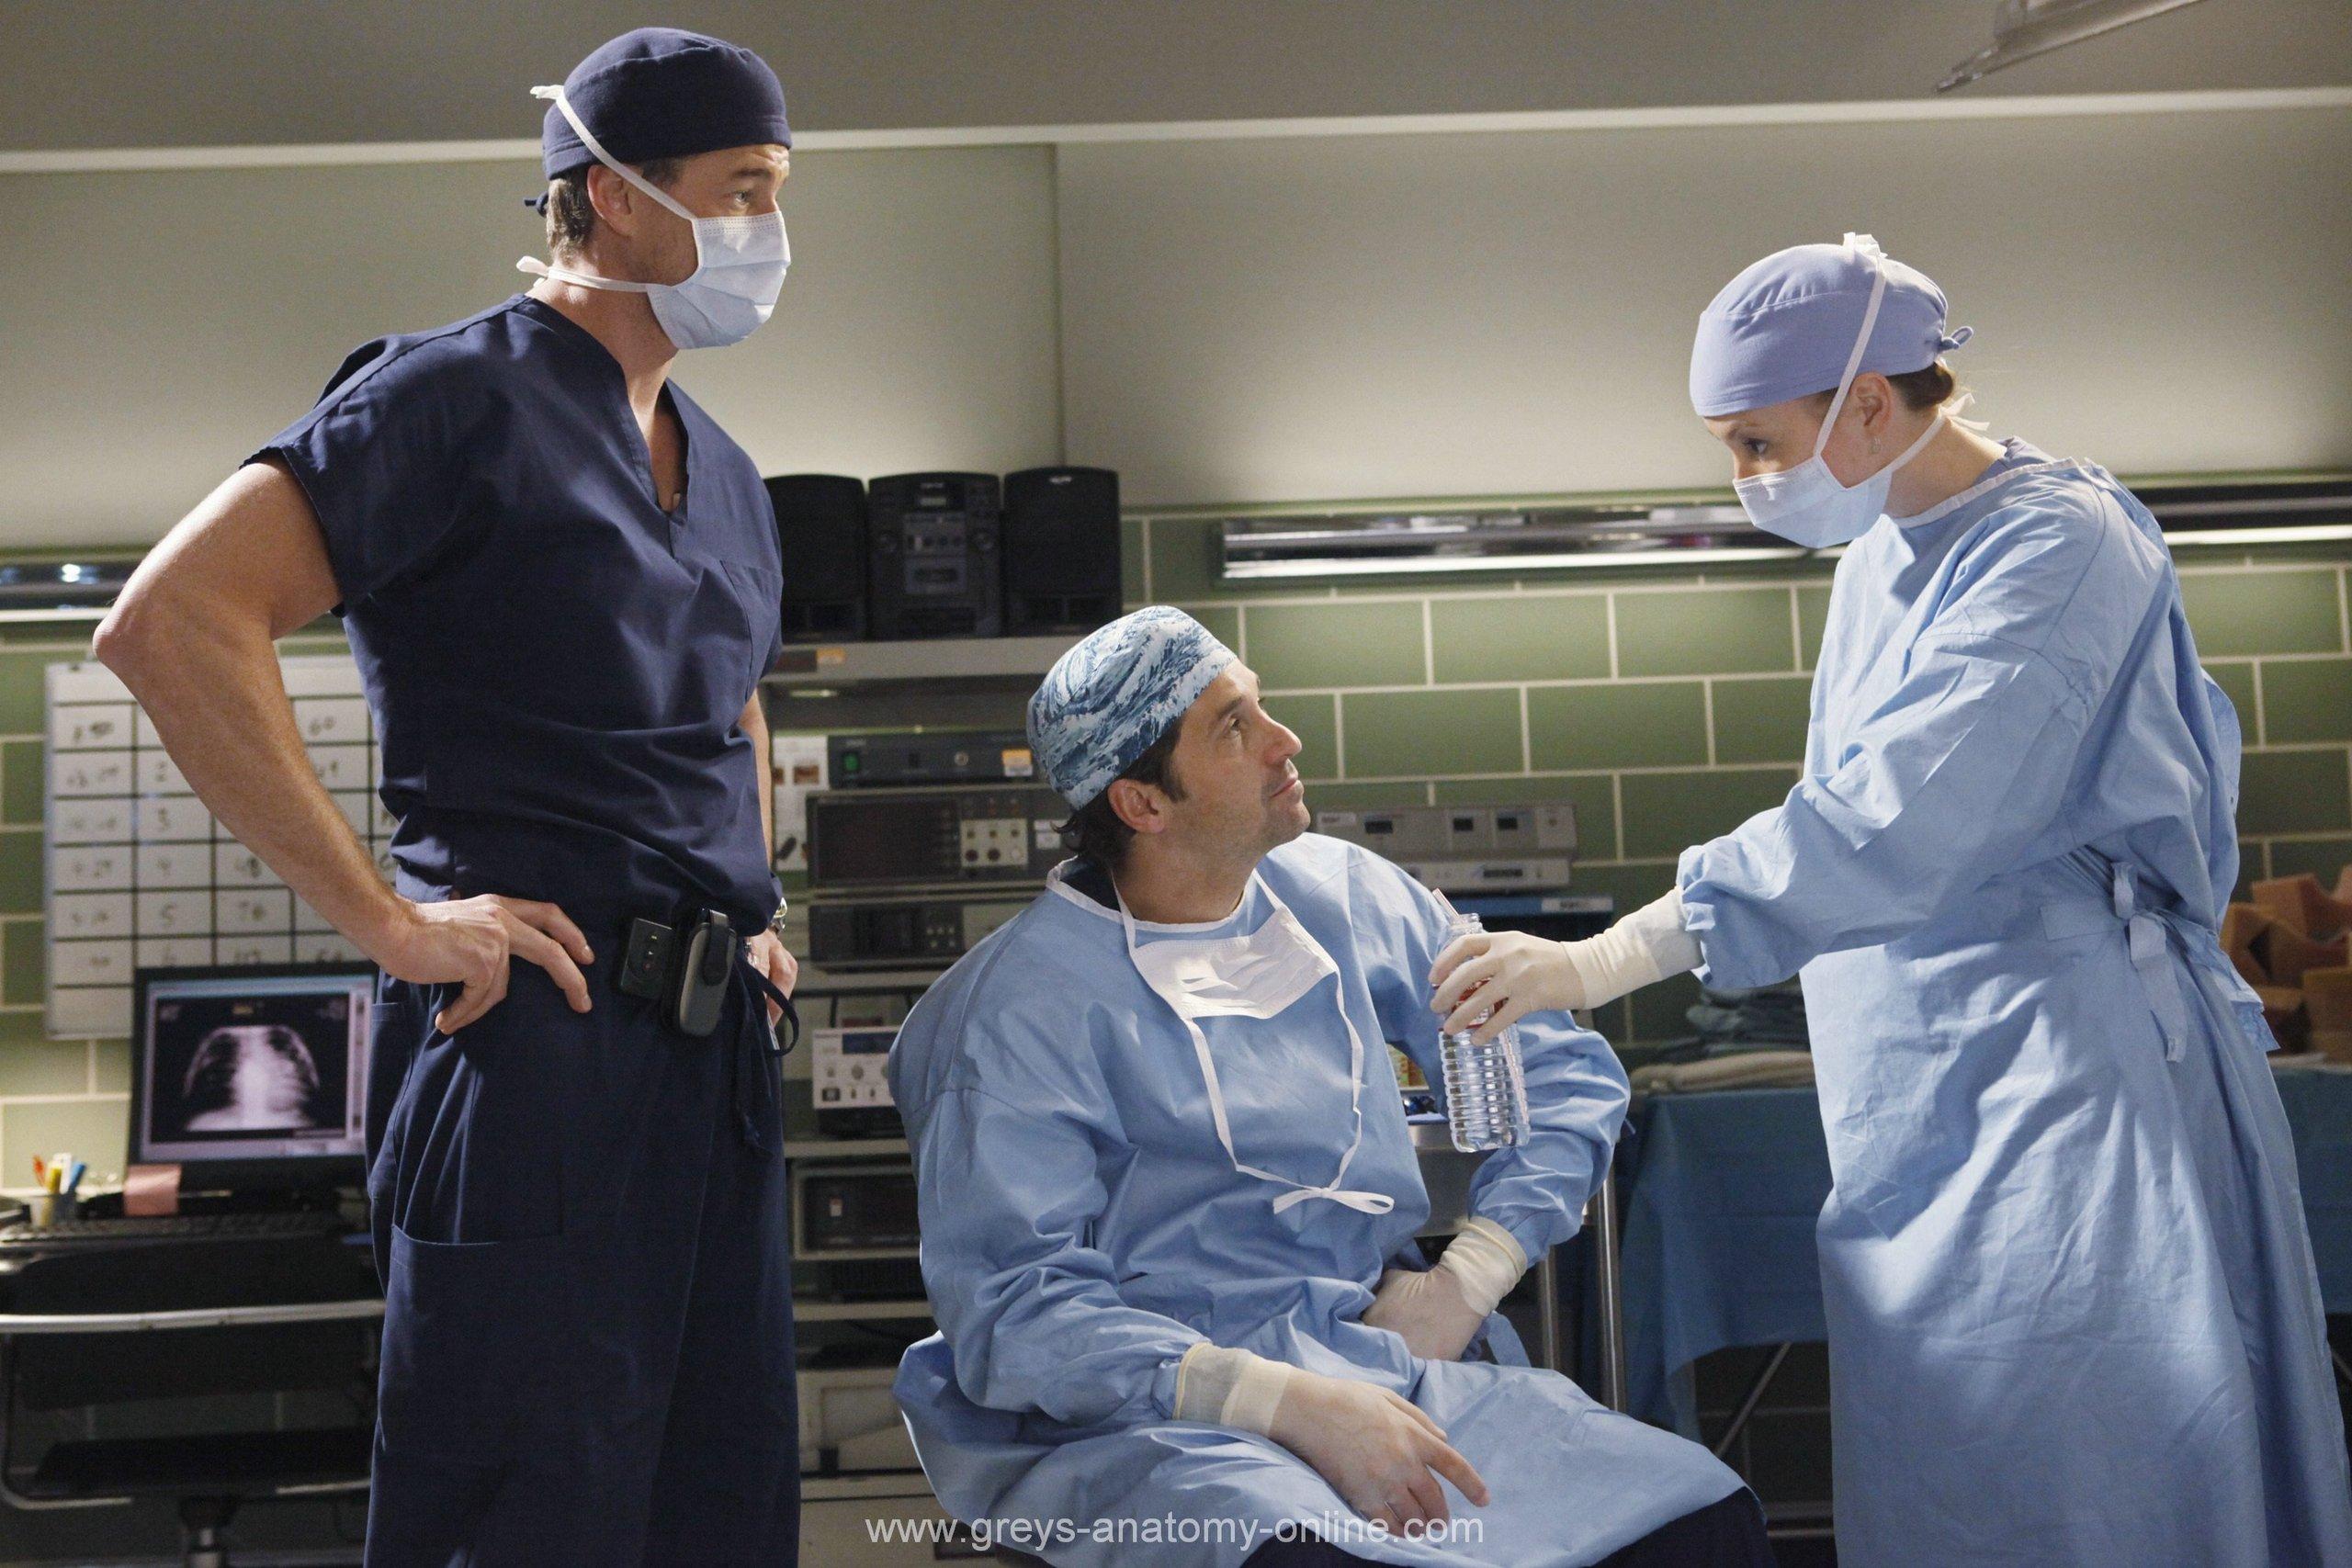 Greys anatomy episods